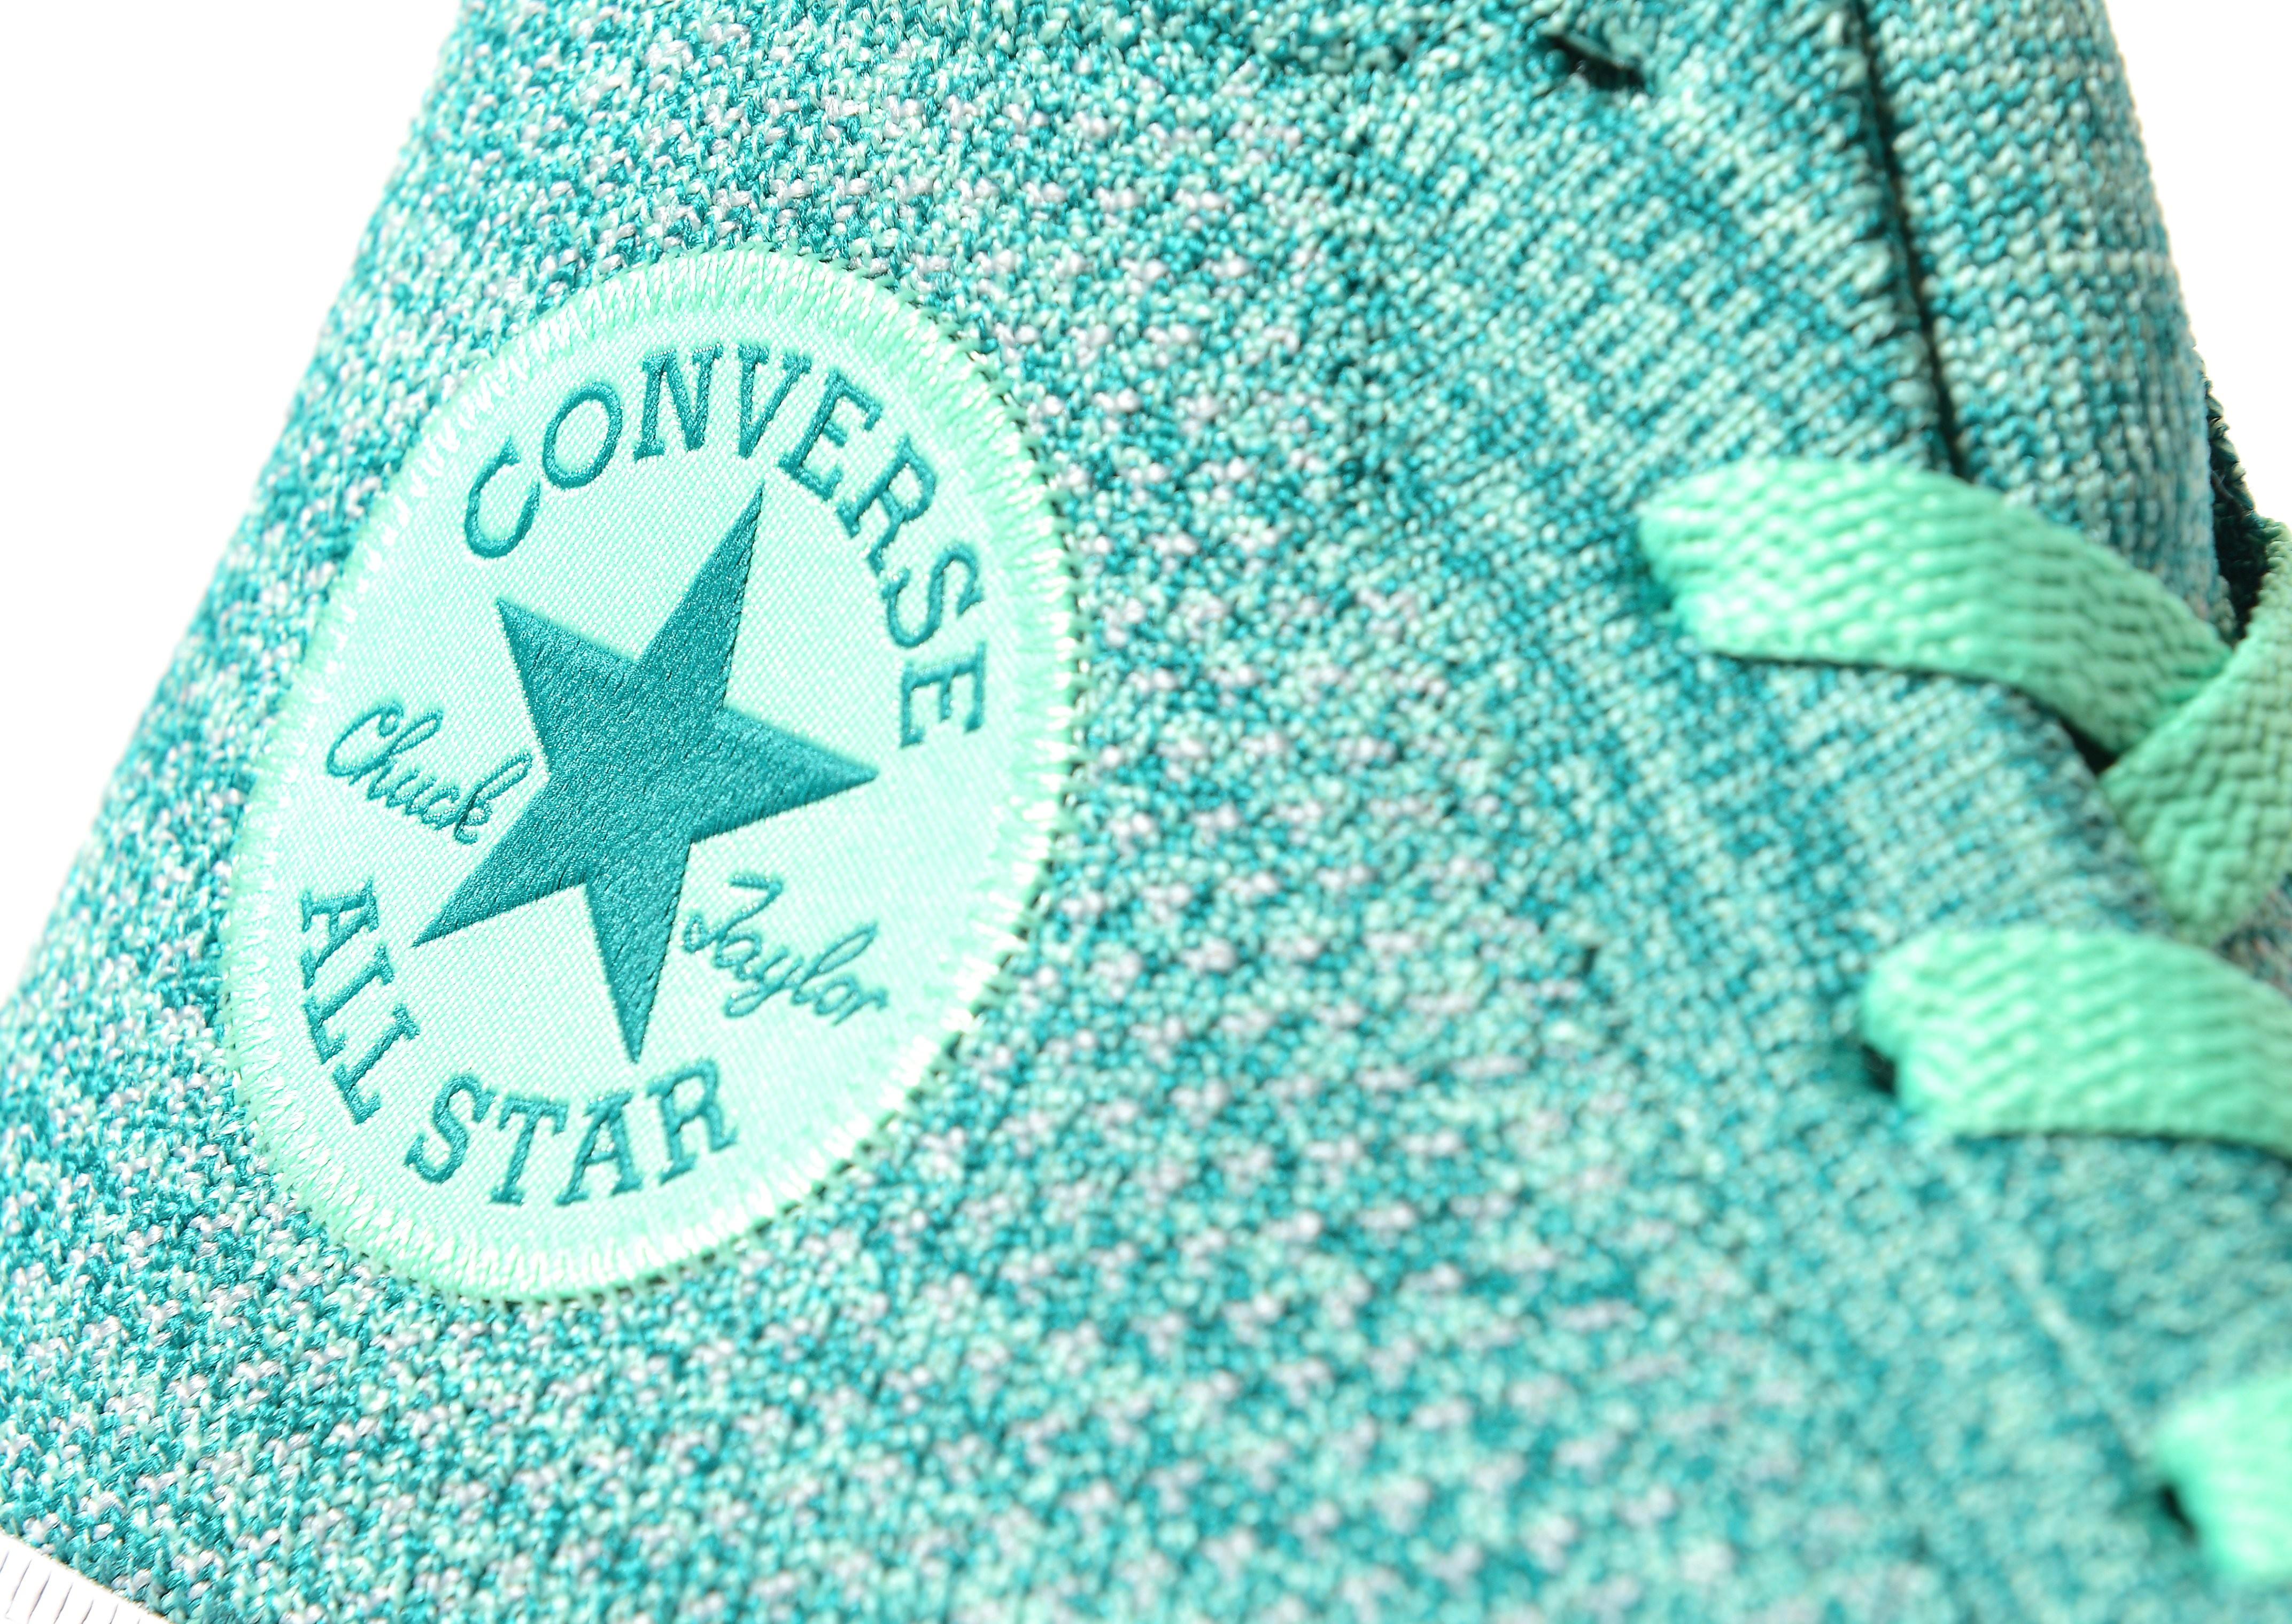 Converse Chuck Taylor All Star Flyknit Dames